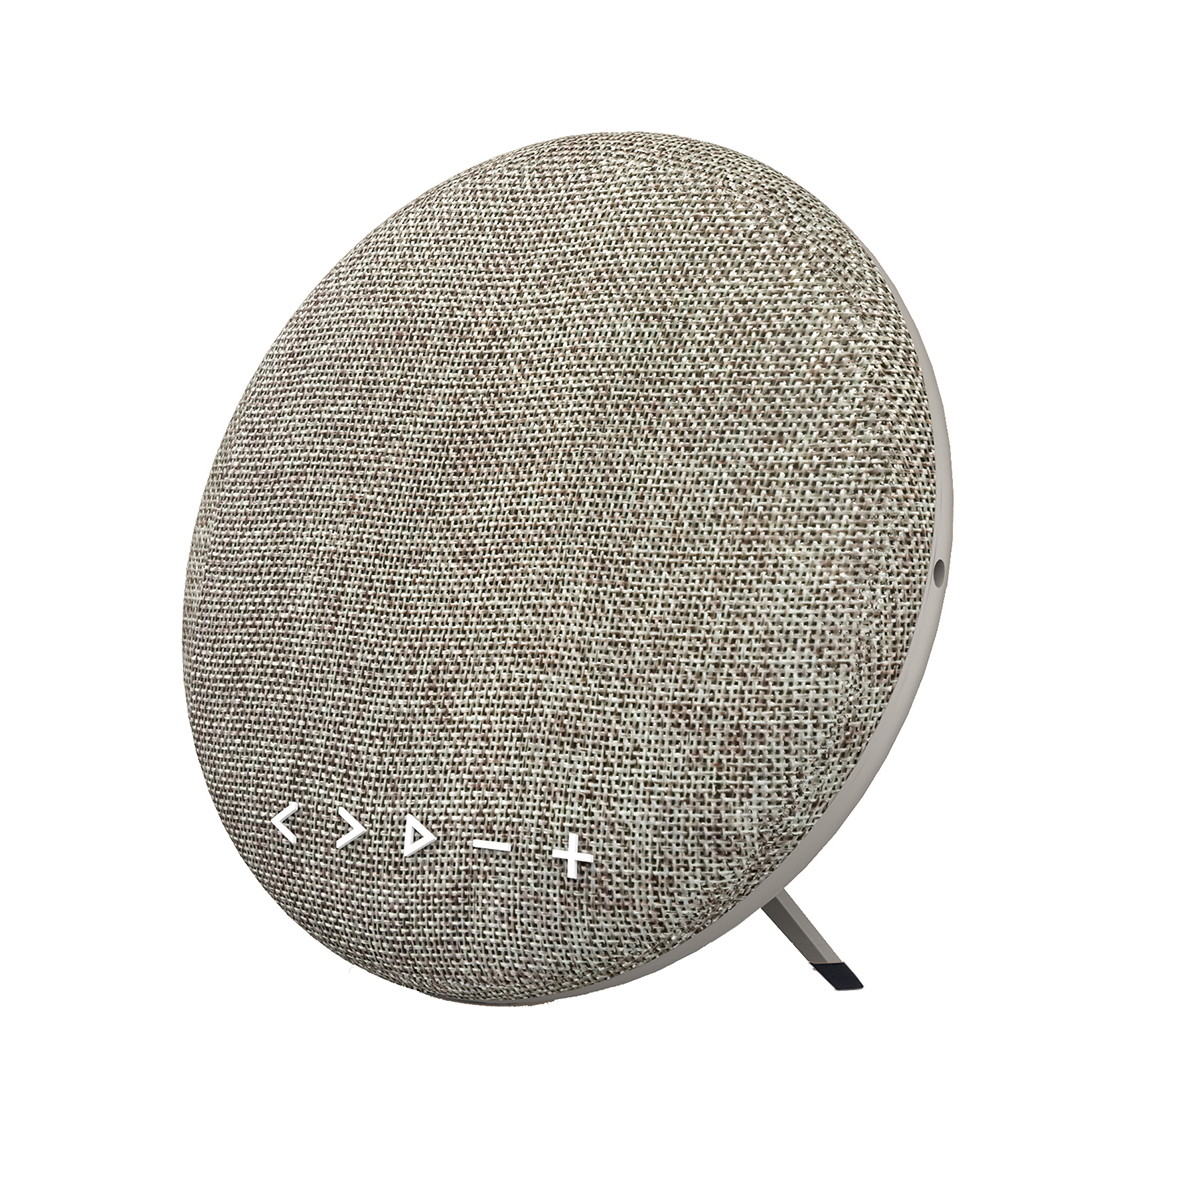 cc8fad767af 12W Fabric TWS Bluetooth Speaker with 4000mAh battery SARDiNE F6